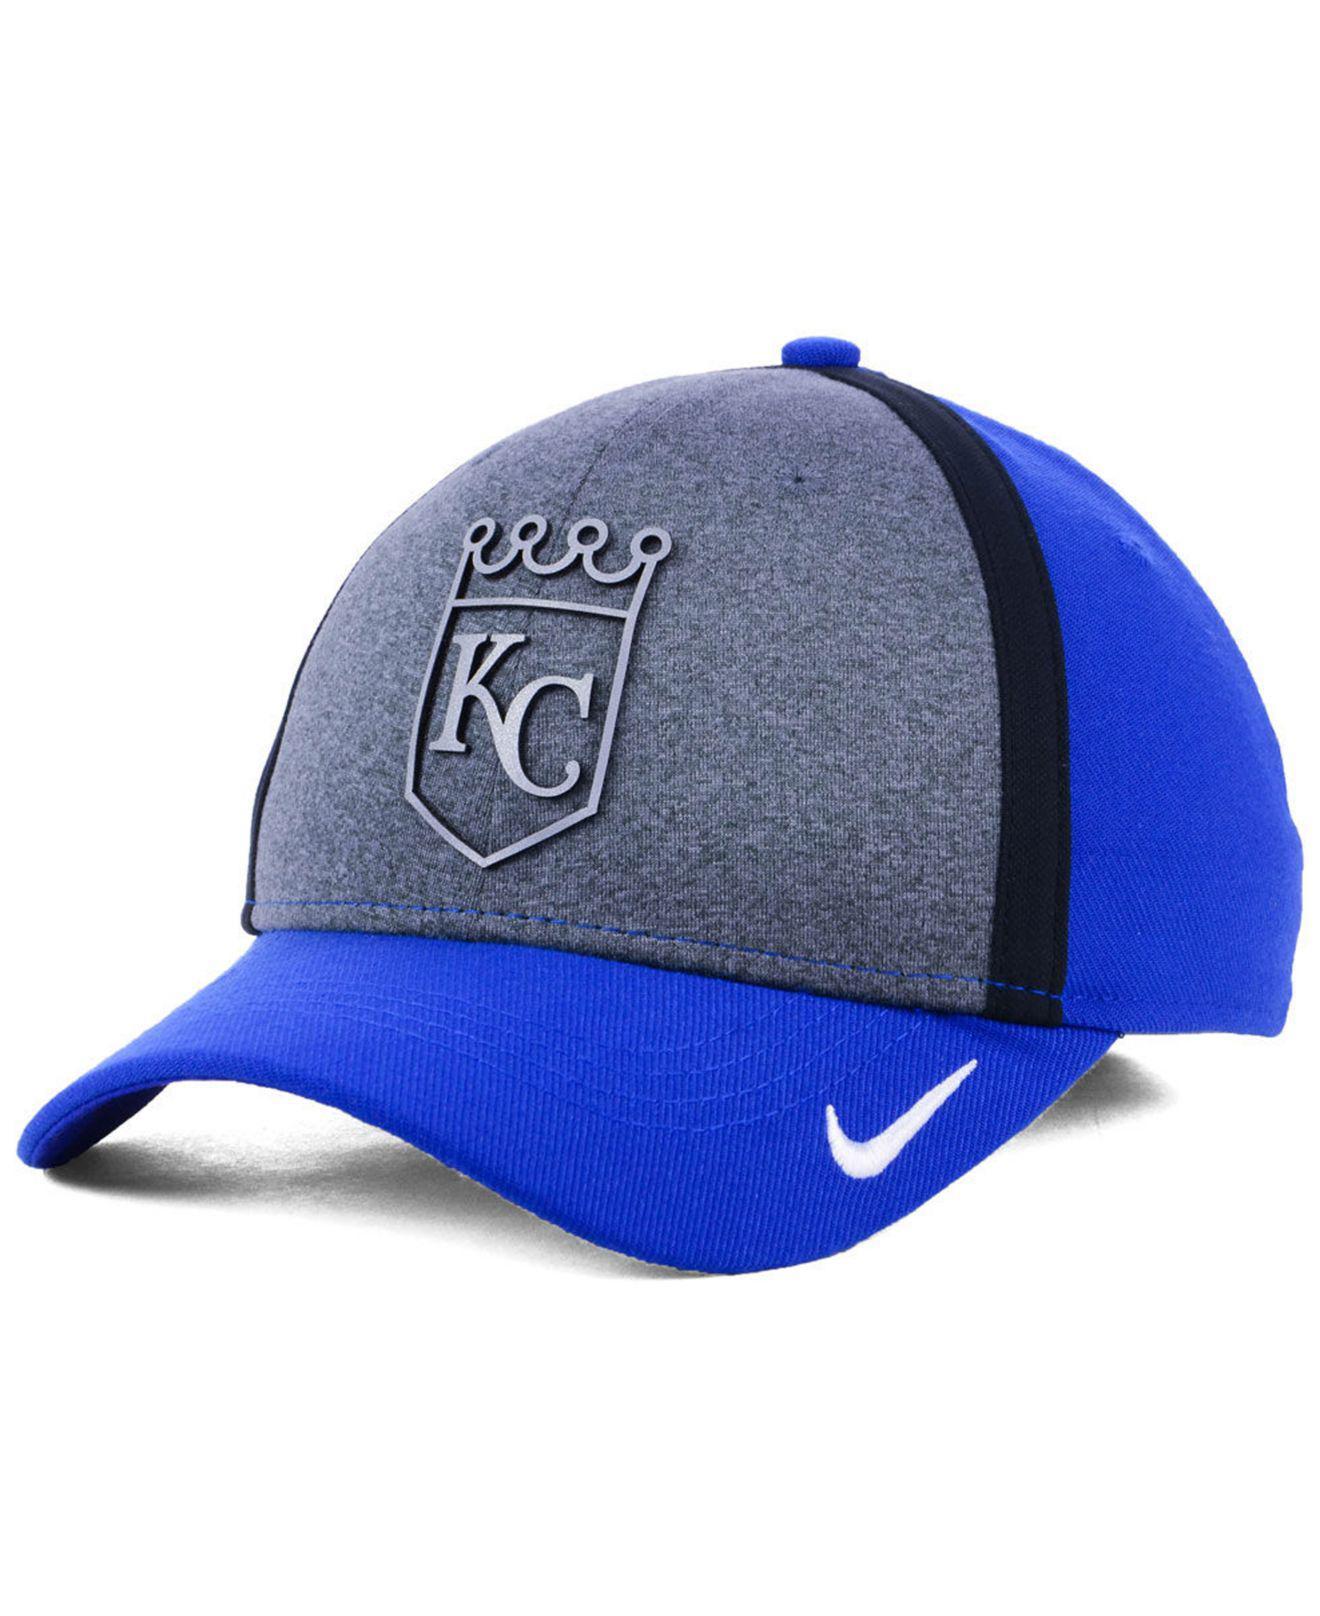 7410cc73 Lyst - Nike Kansas City Royals Team Color Reflective Swooshflex Cap ...